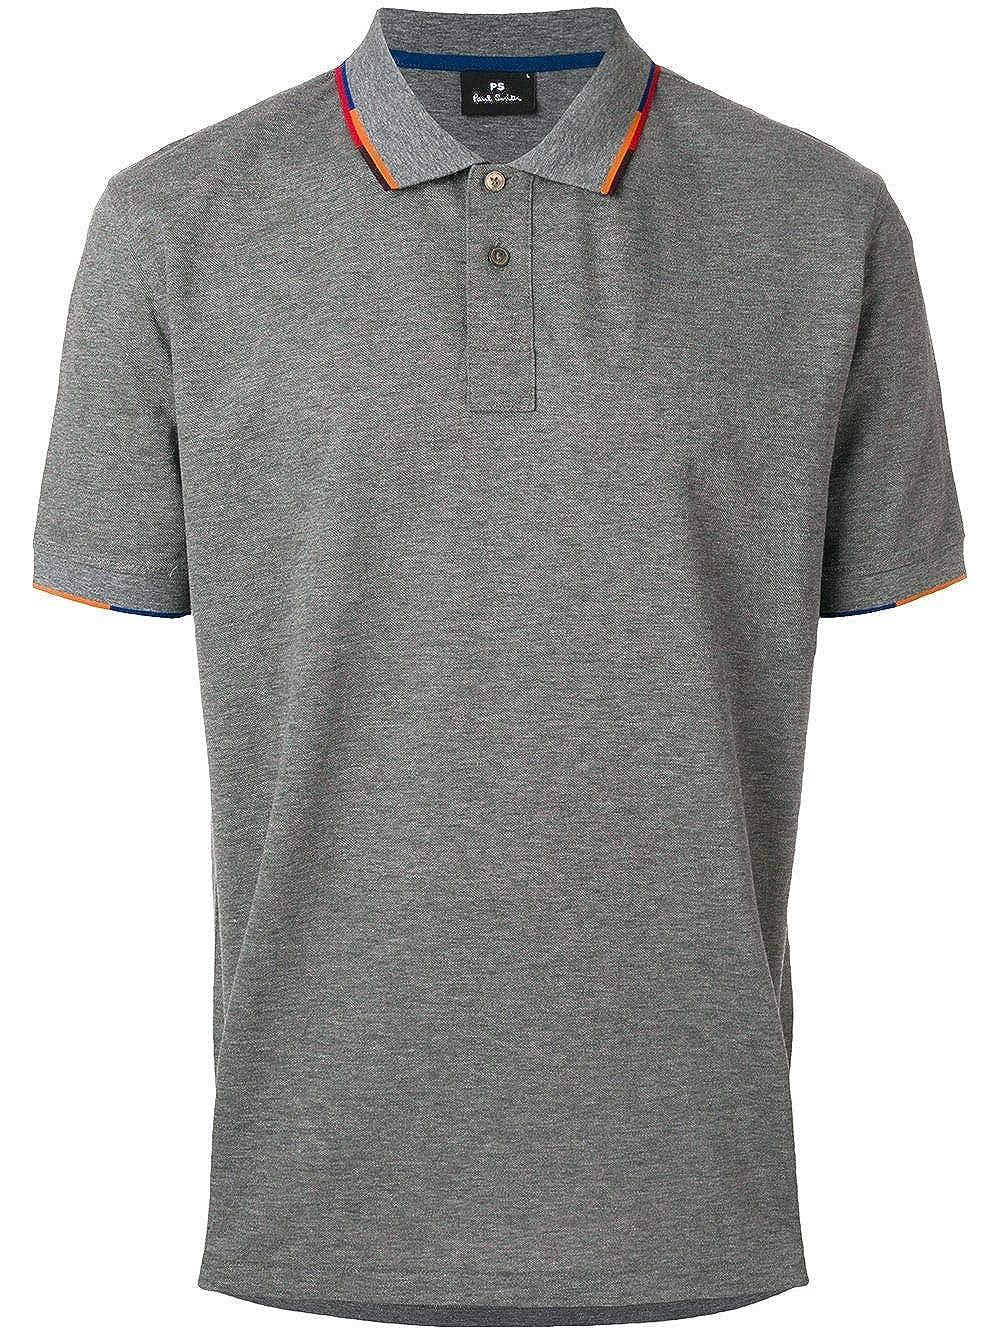 Paul Smith Luxury Fashion Mens Polo Shirt Summer Grey